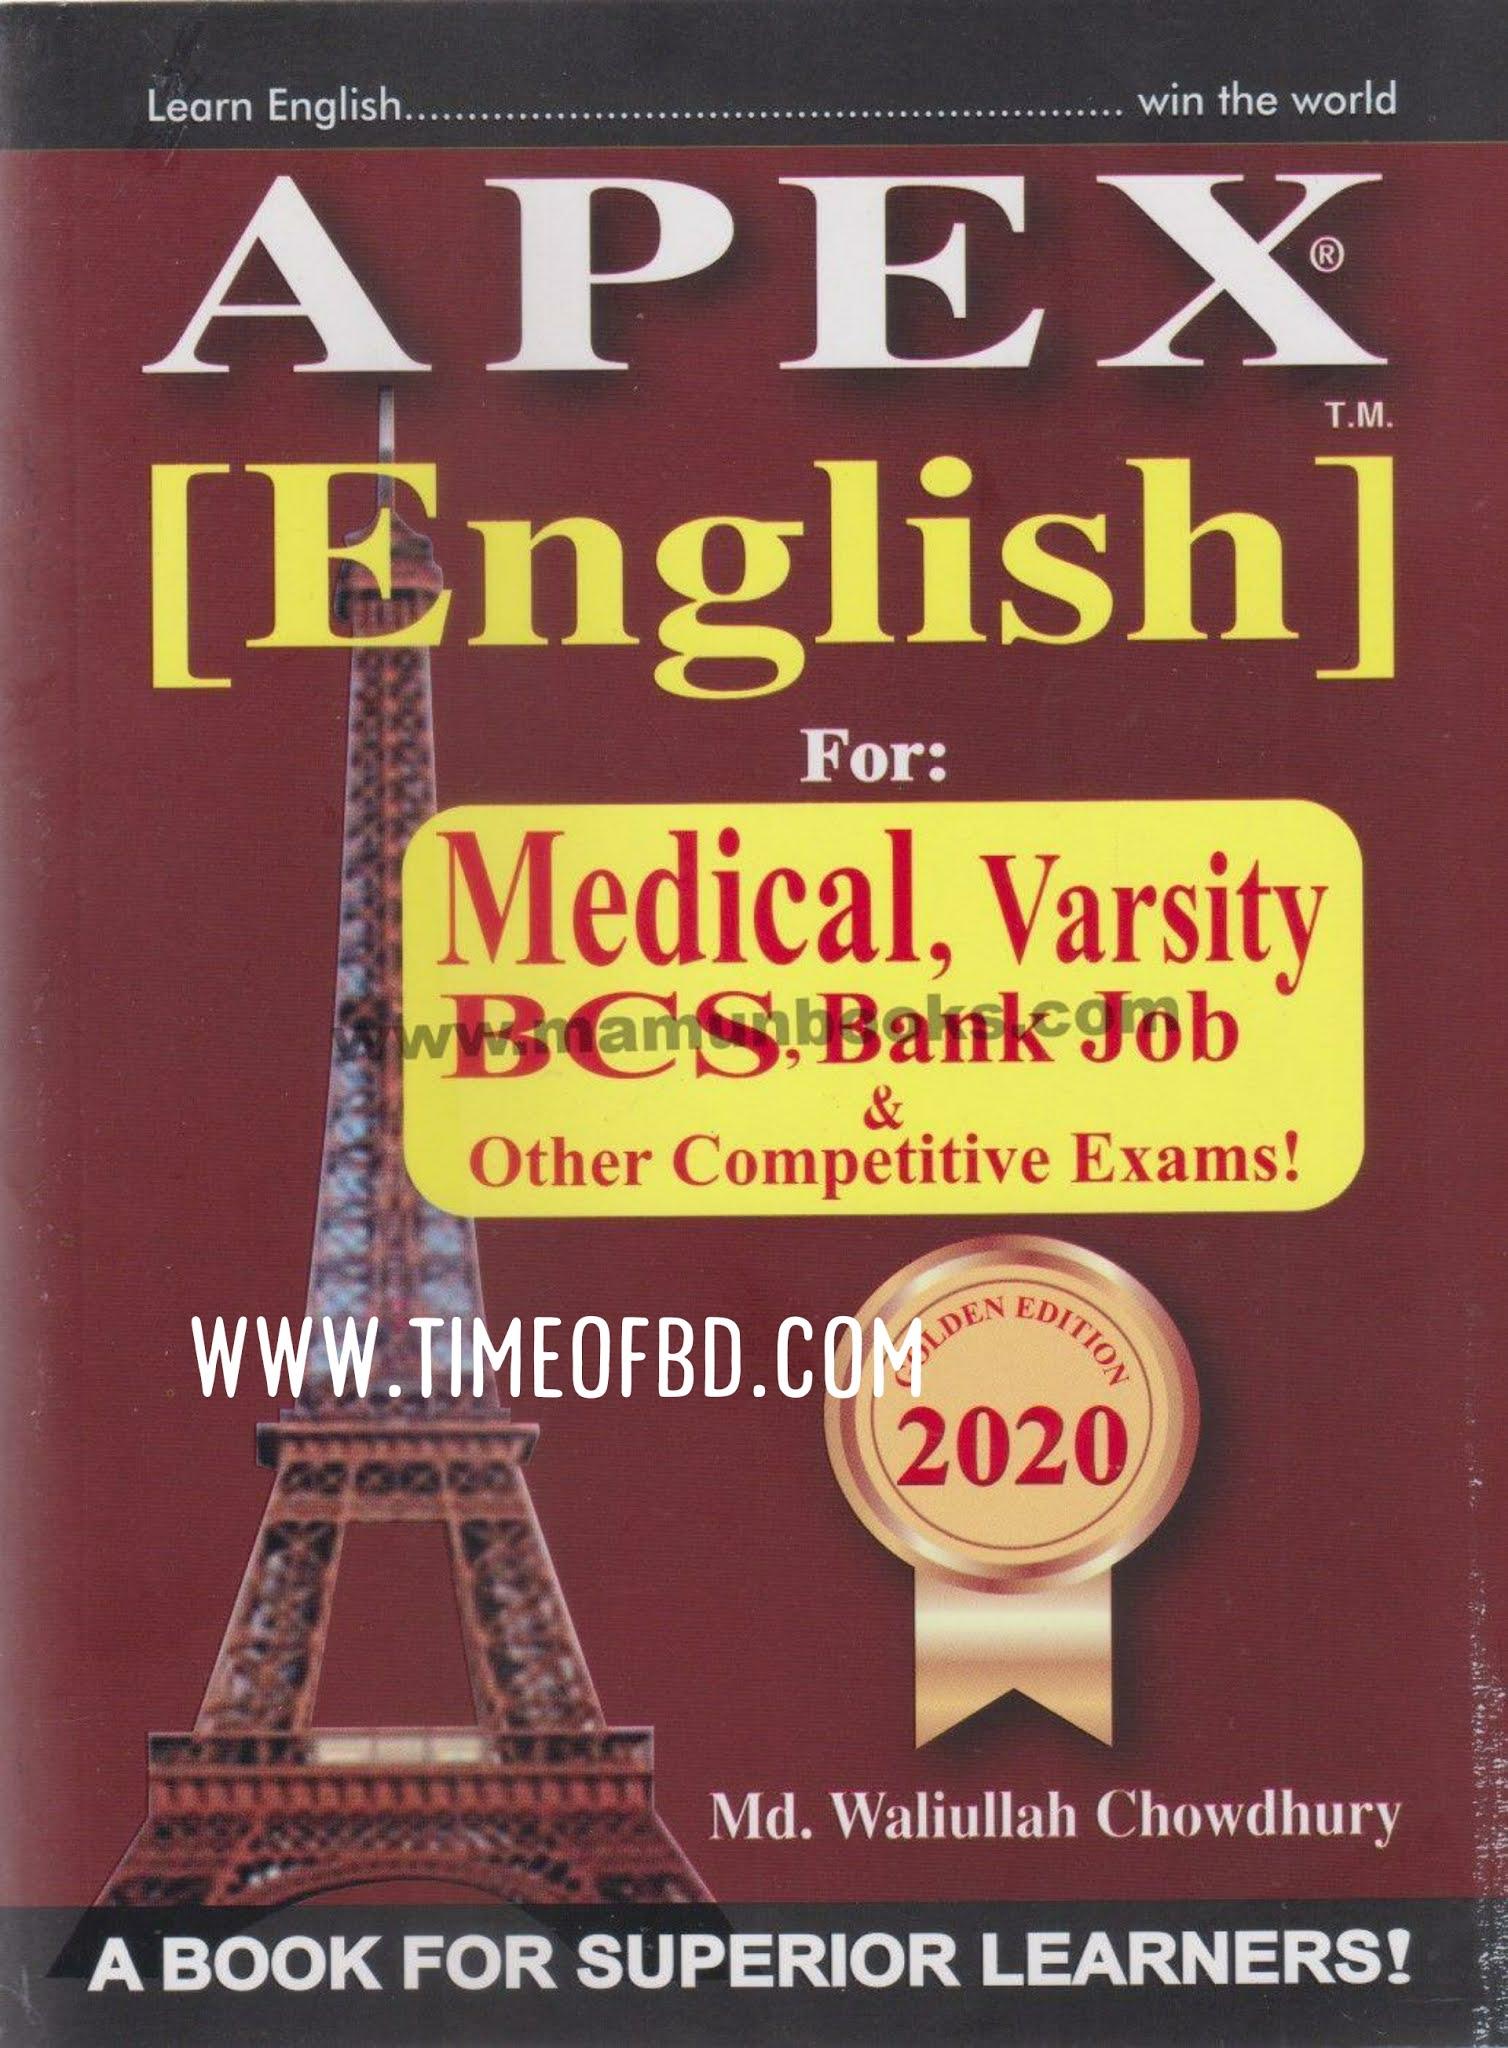 Apex english book।  এপেক্স ইংলিশ বুক